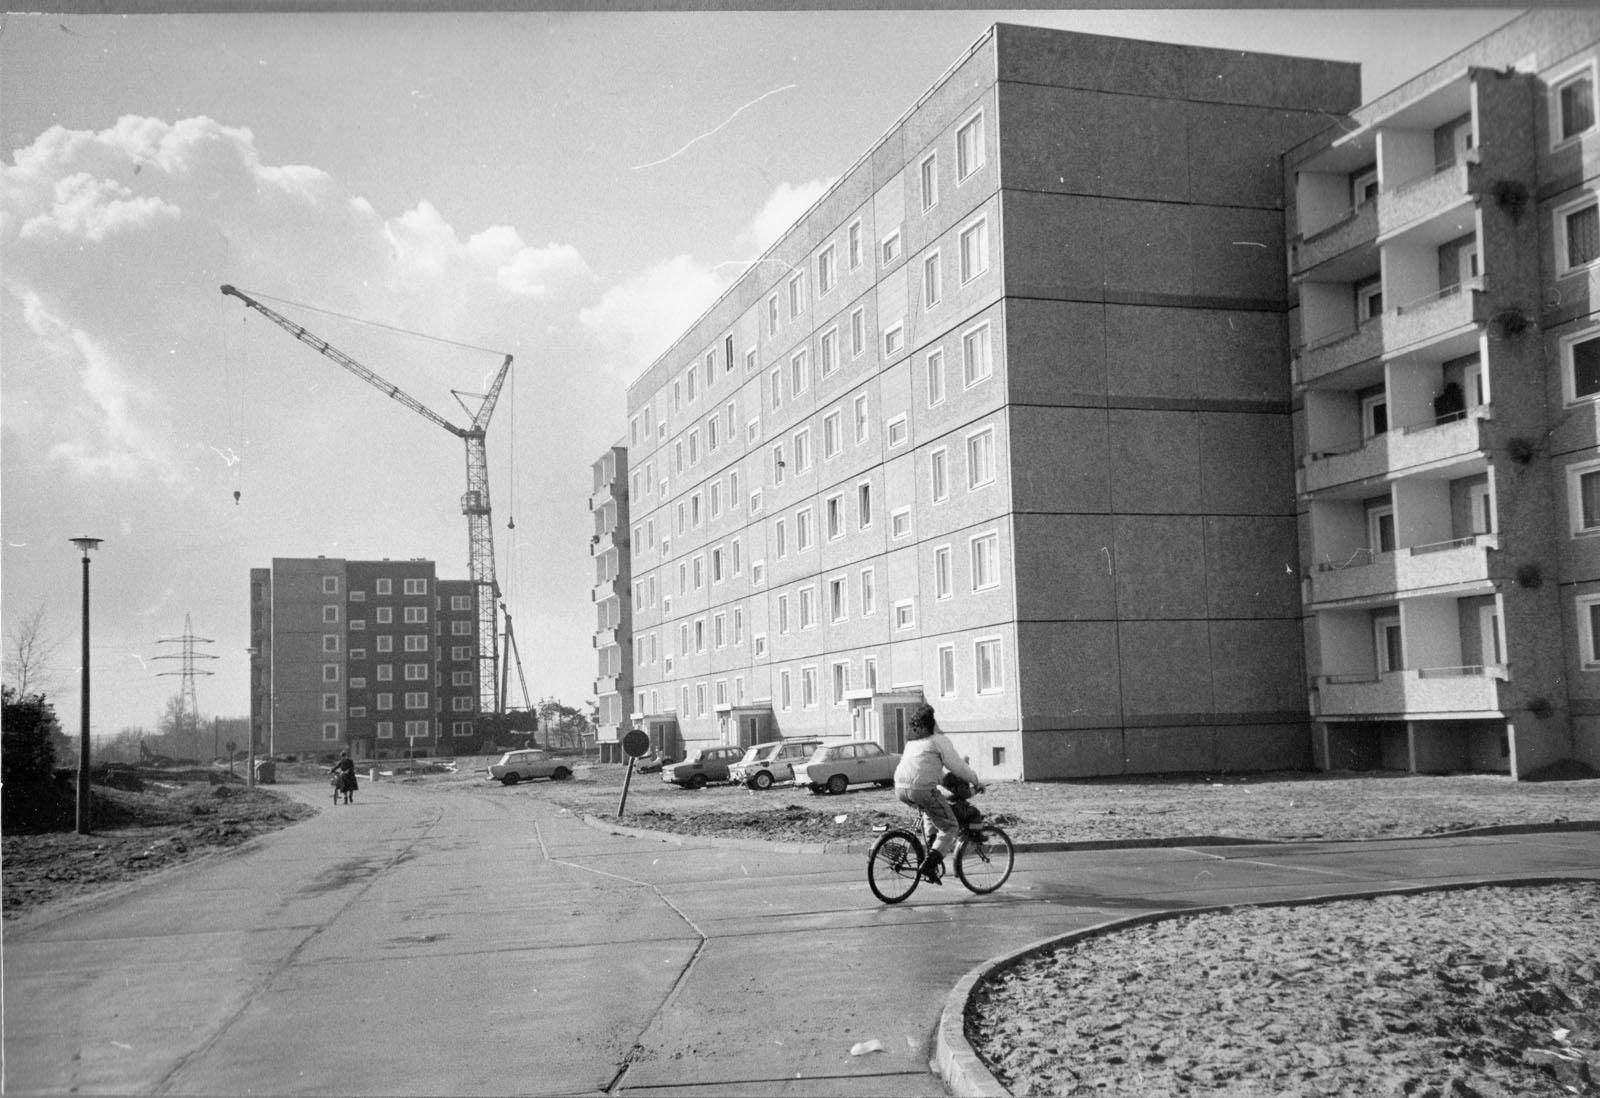 Wohnkomplex X um 1980